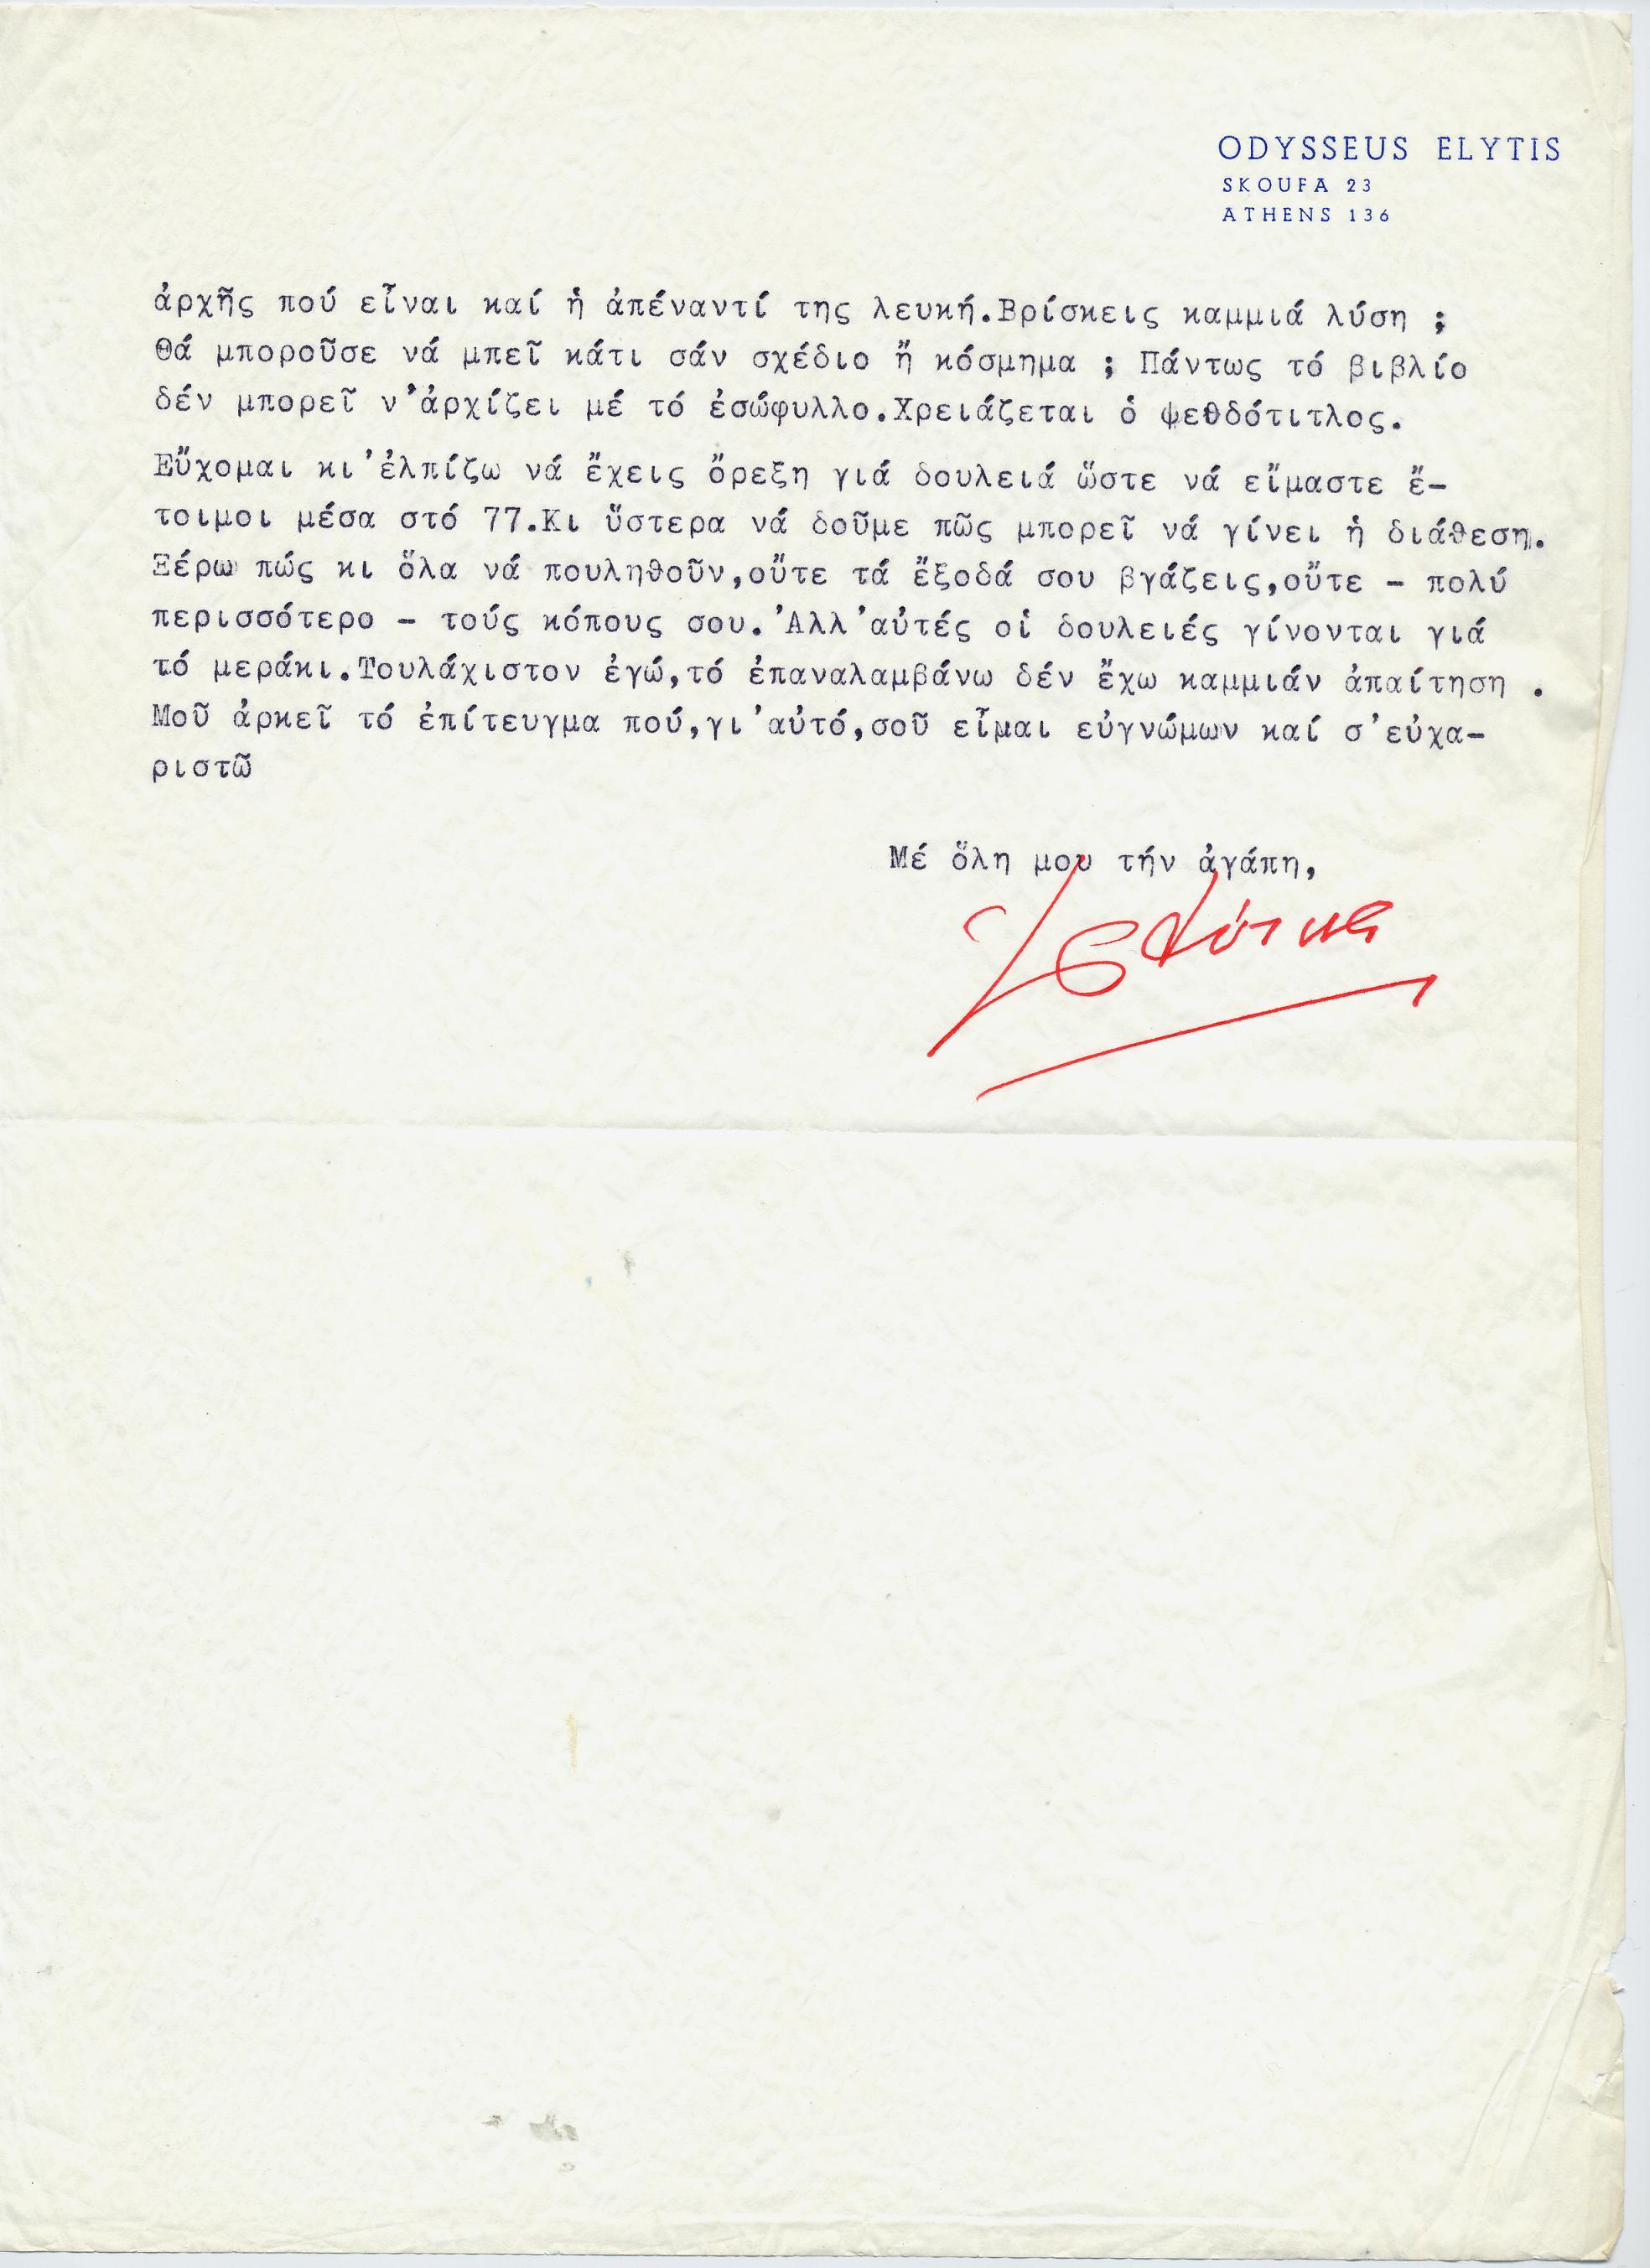 ELYTIS A DIMITRI - 25.01.1977 - B